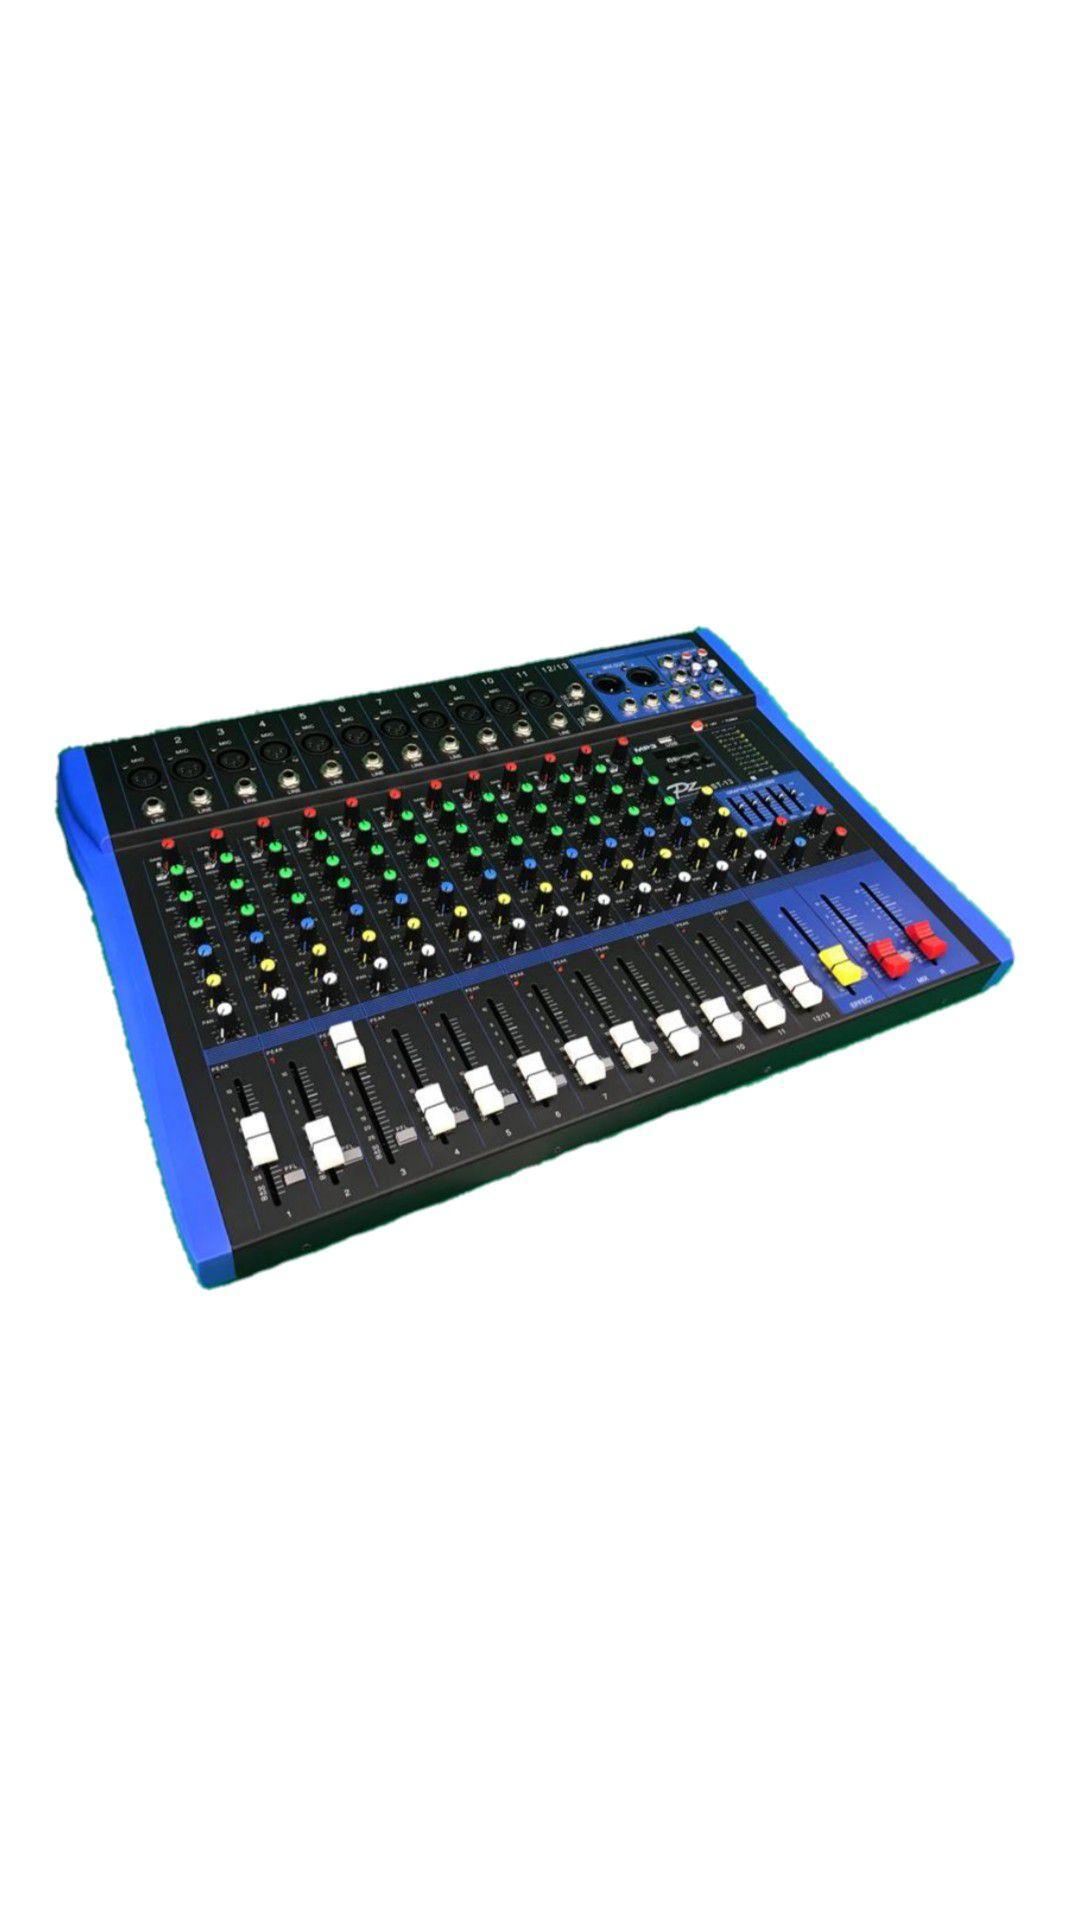 MESA.13CANAIS PZ PROAUDIO PZST13 9XLR 2P10 C/PHANTOM USB BLUETOOTH 1AUX